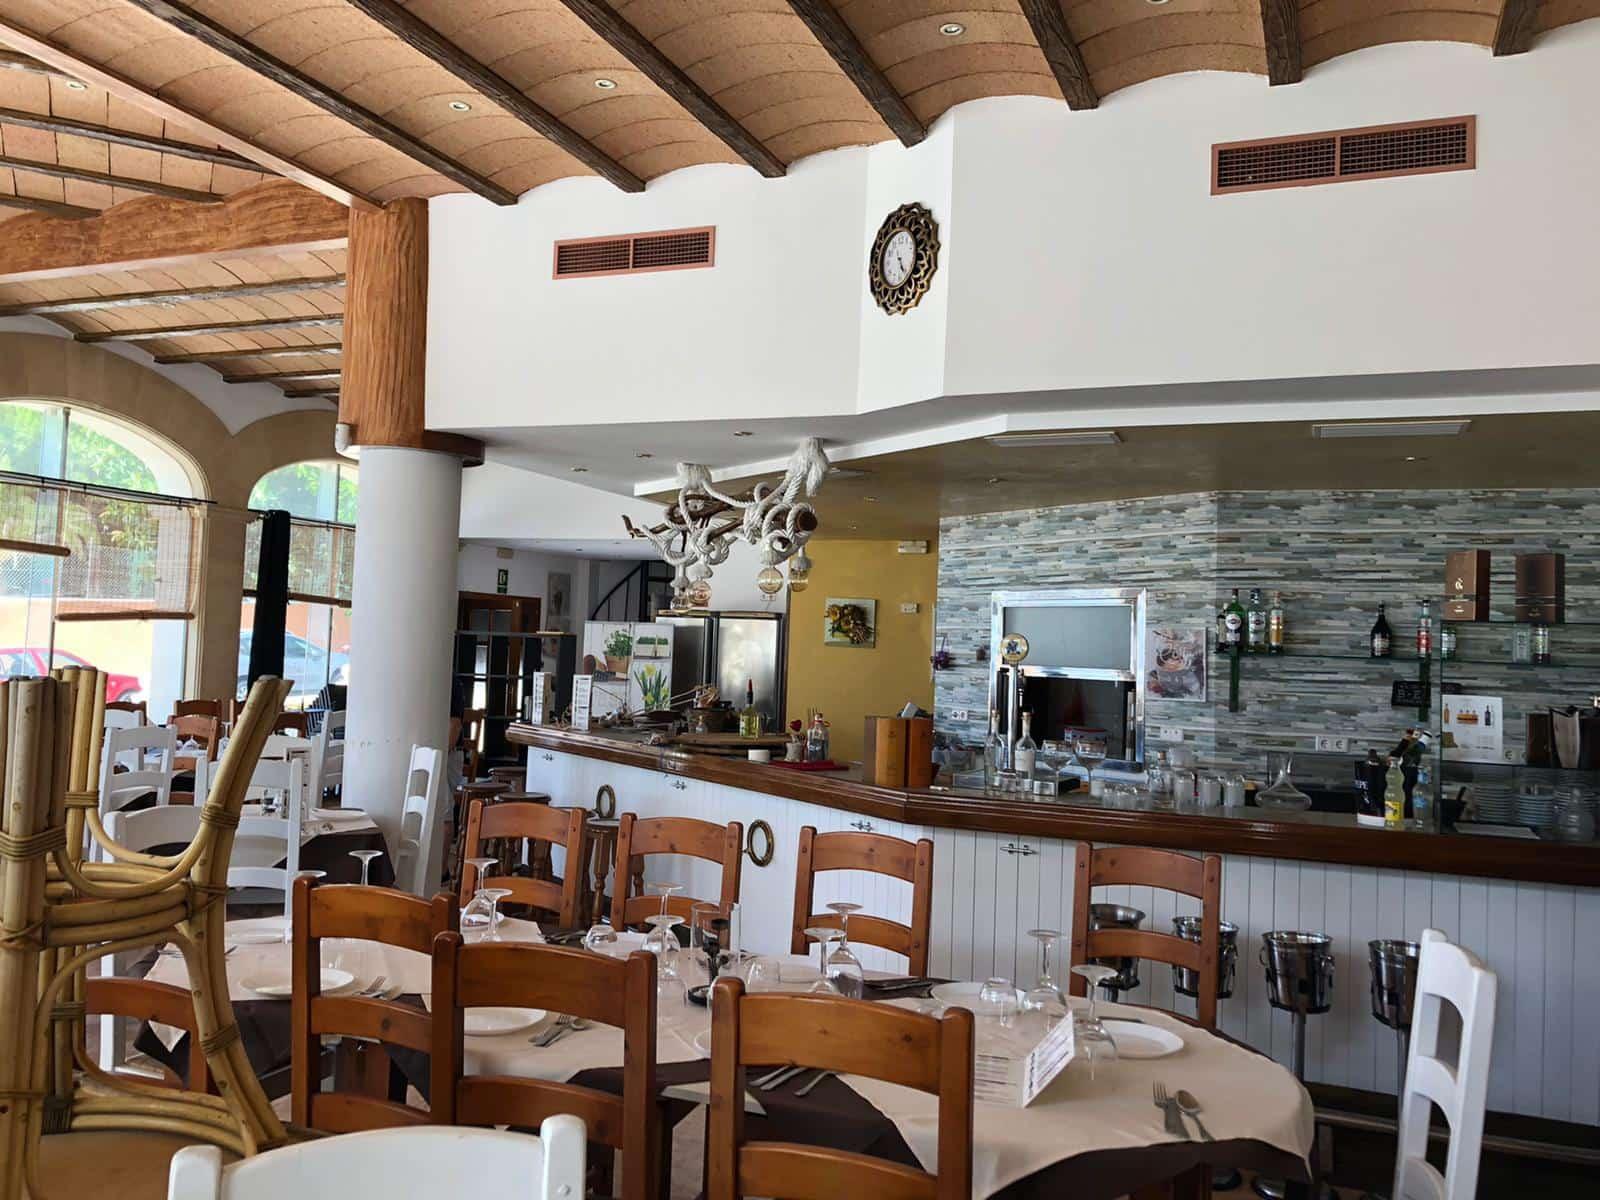 Restaurant/Bar à vendre à Cala Mayor - 480 000 € (Ref: 5405480)